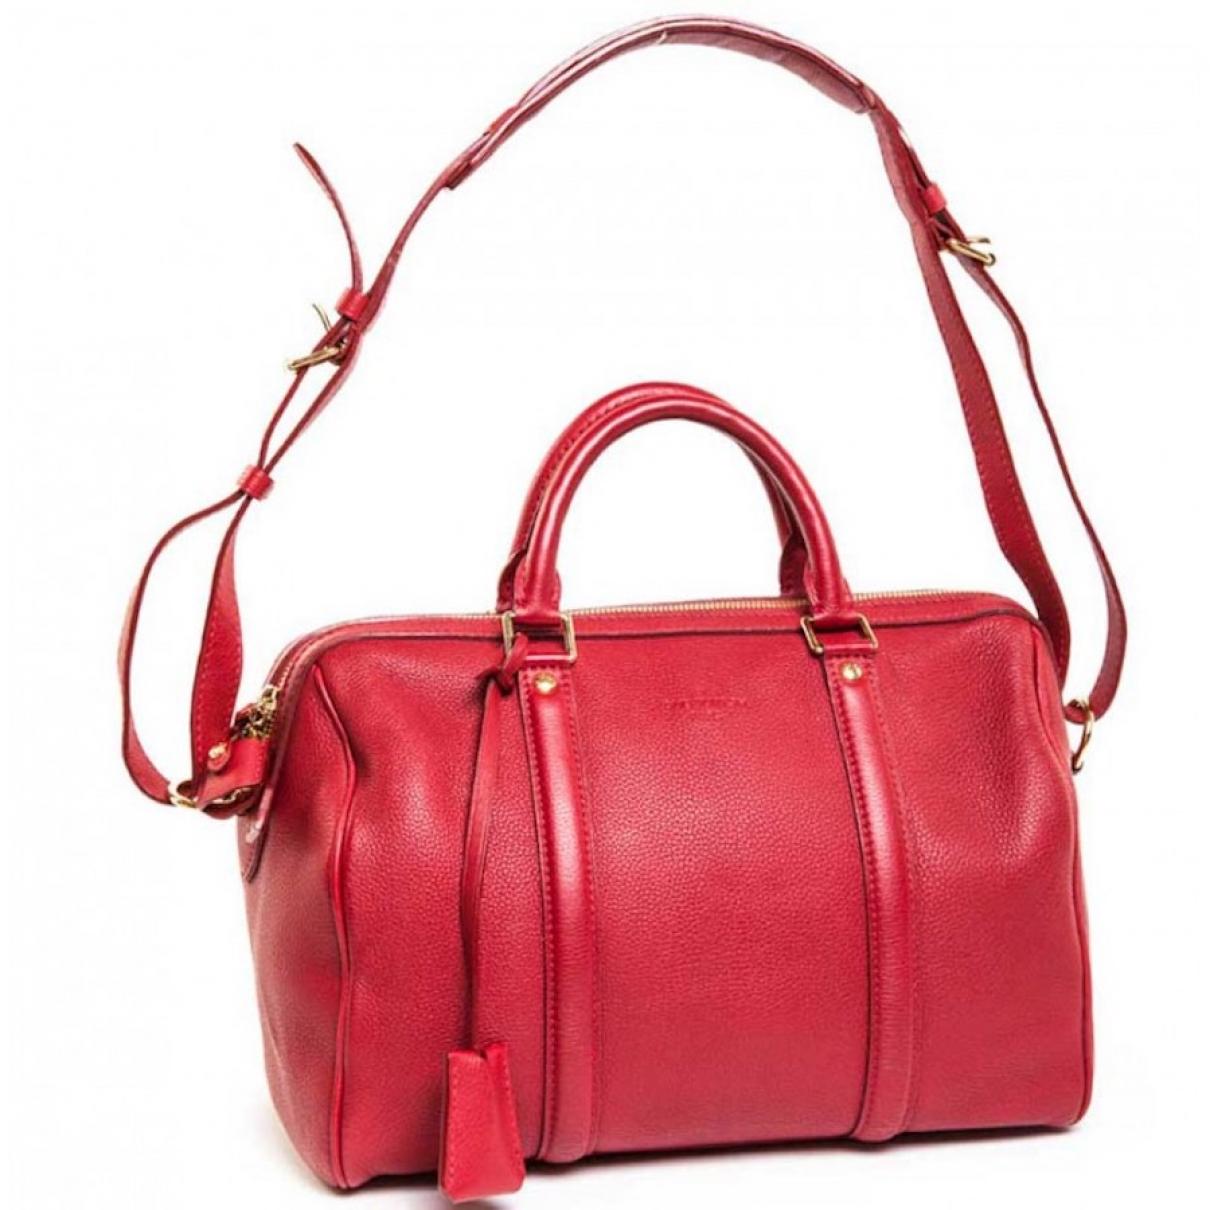 Louis Vuitton Sofia Coppola Handtasche in  Rot Leder